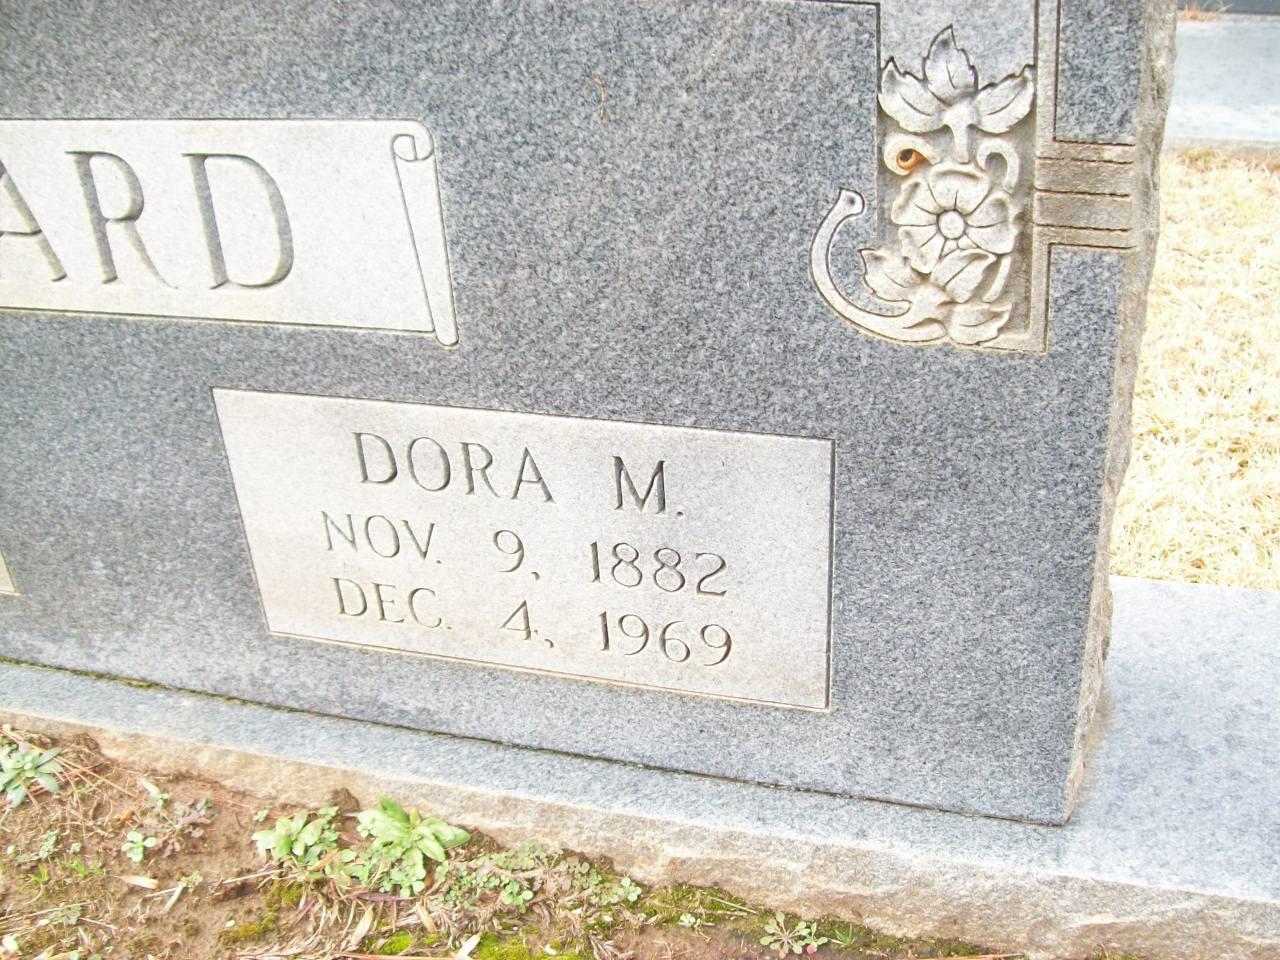 Dora M Beard